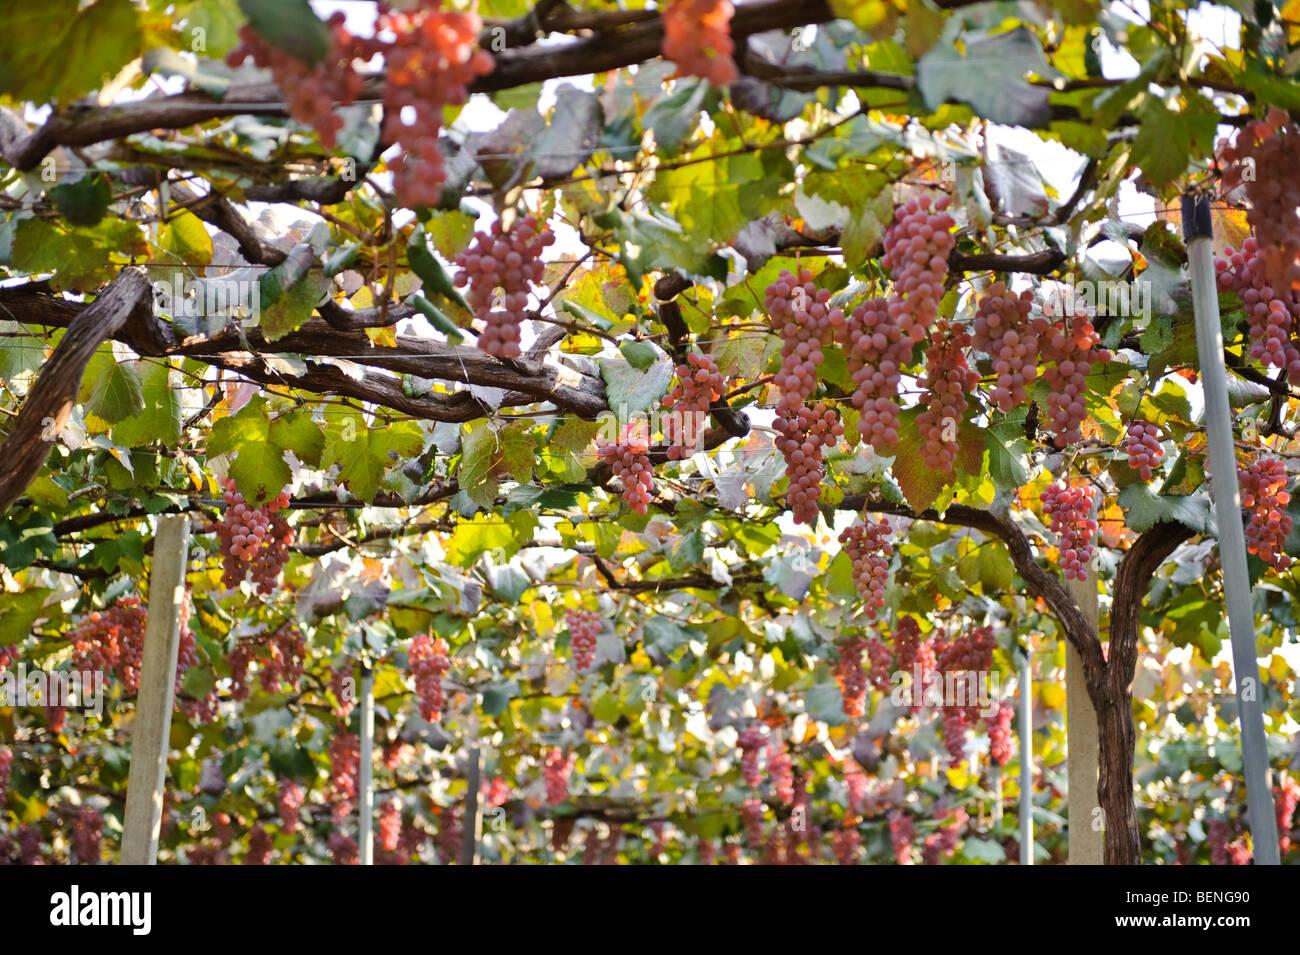 Vineyards in Katsunuma, Yamanashi Prefecture, Japan, October 12, 2009. - Stock Image